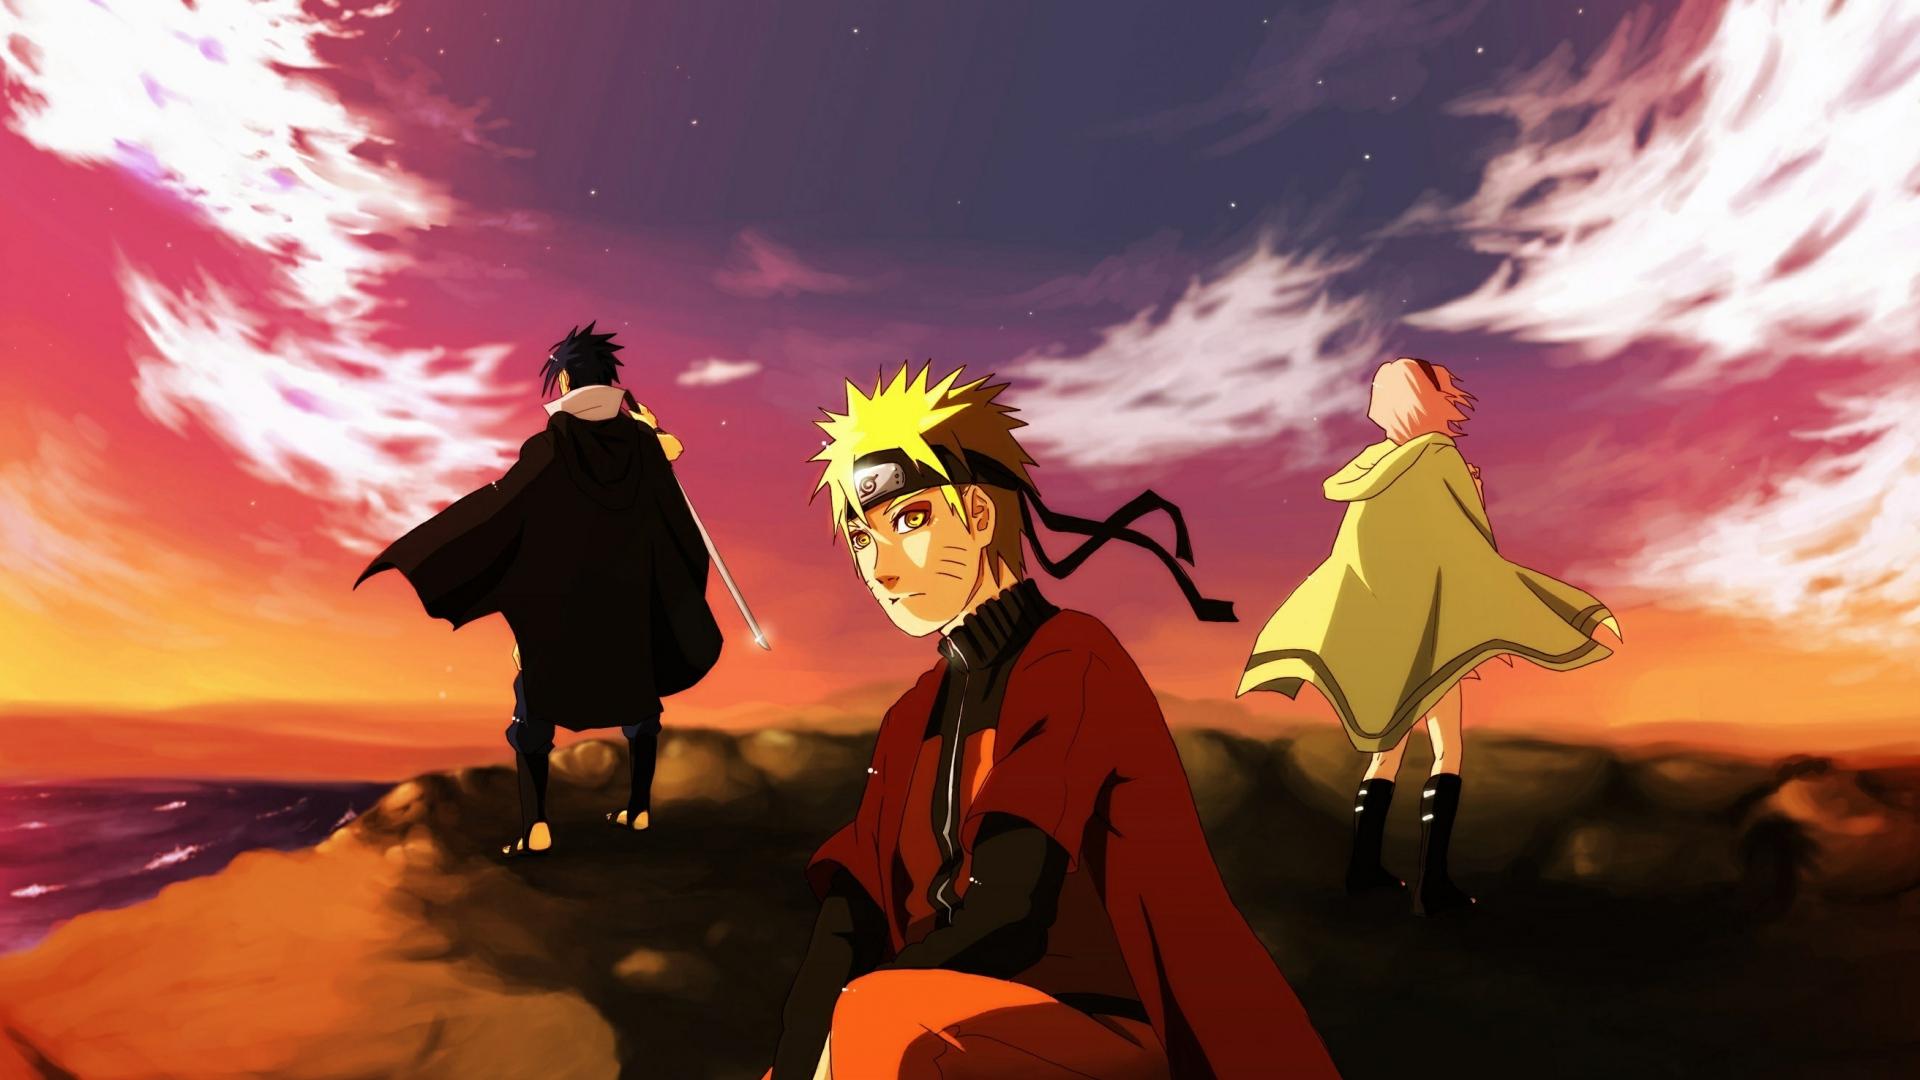 Naruto HD Wallpaper | Hintergrund | 1920x1080 | ID:673433 ...